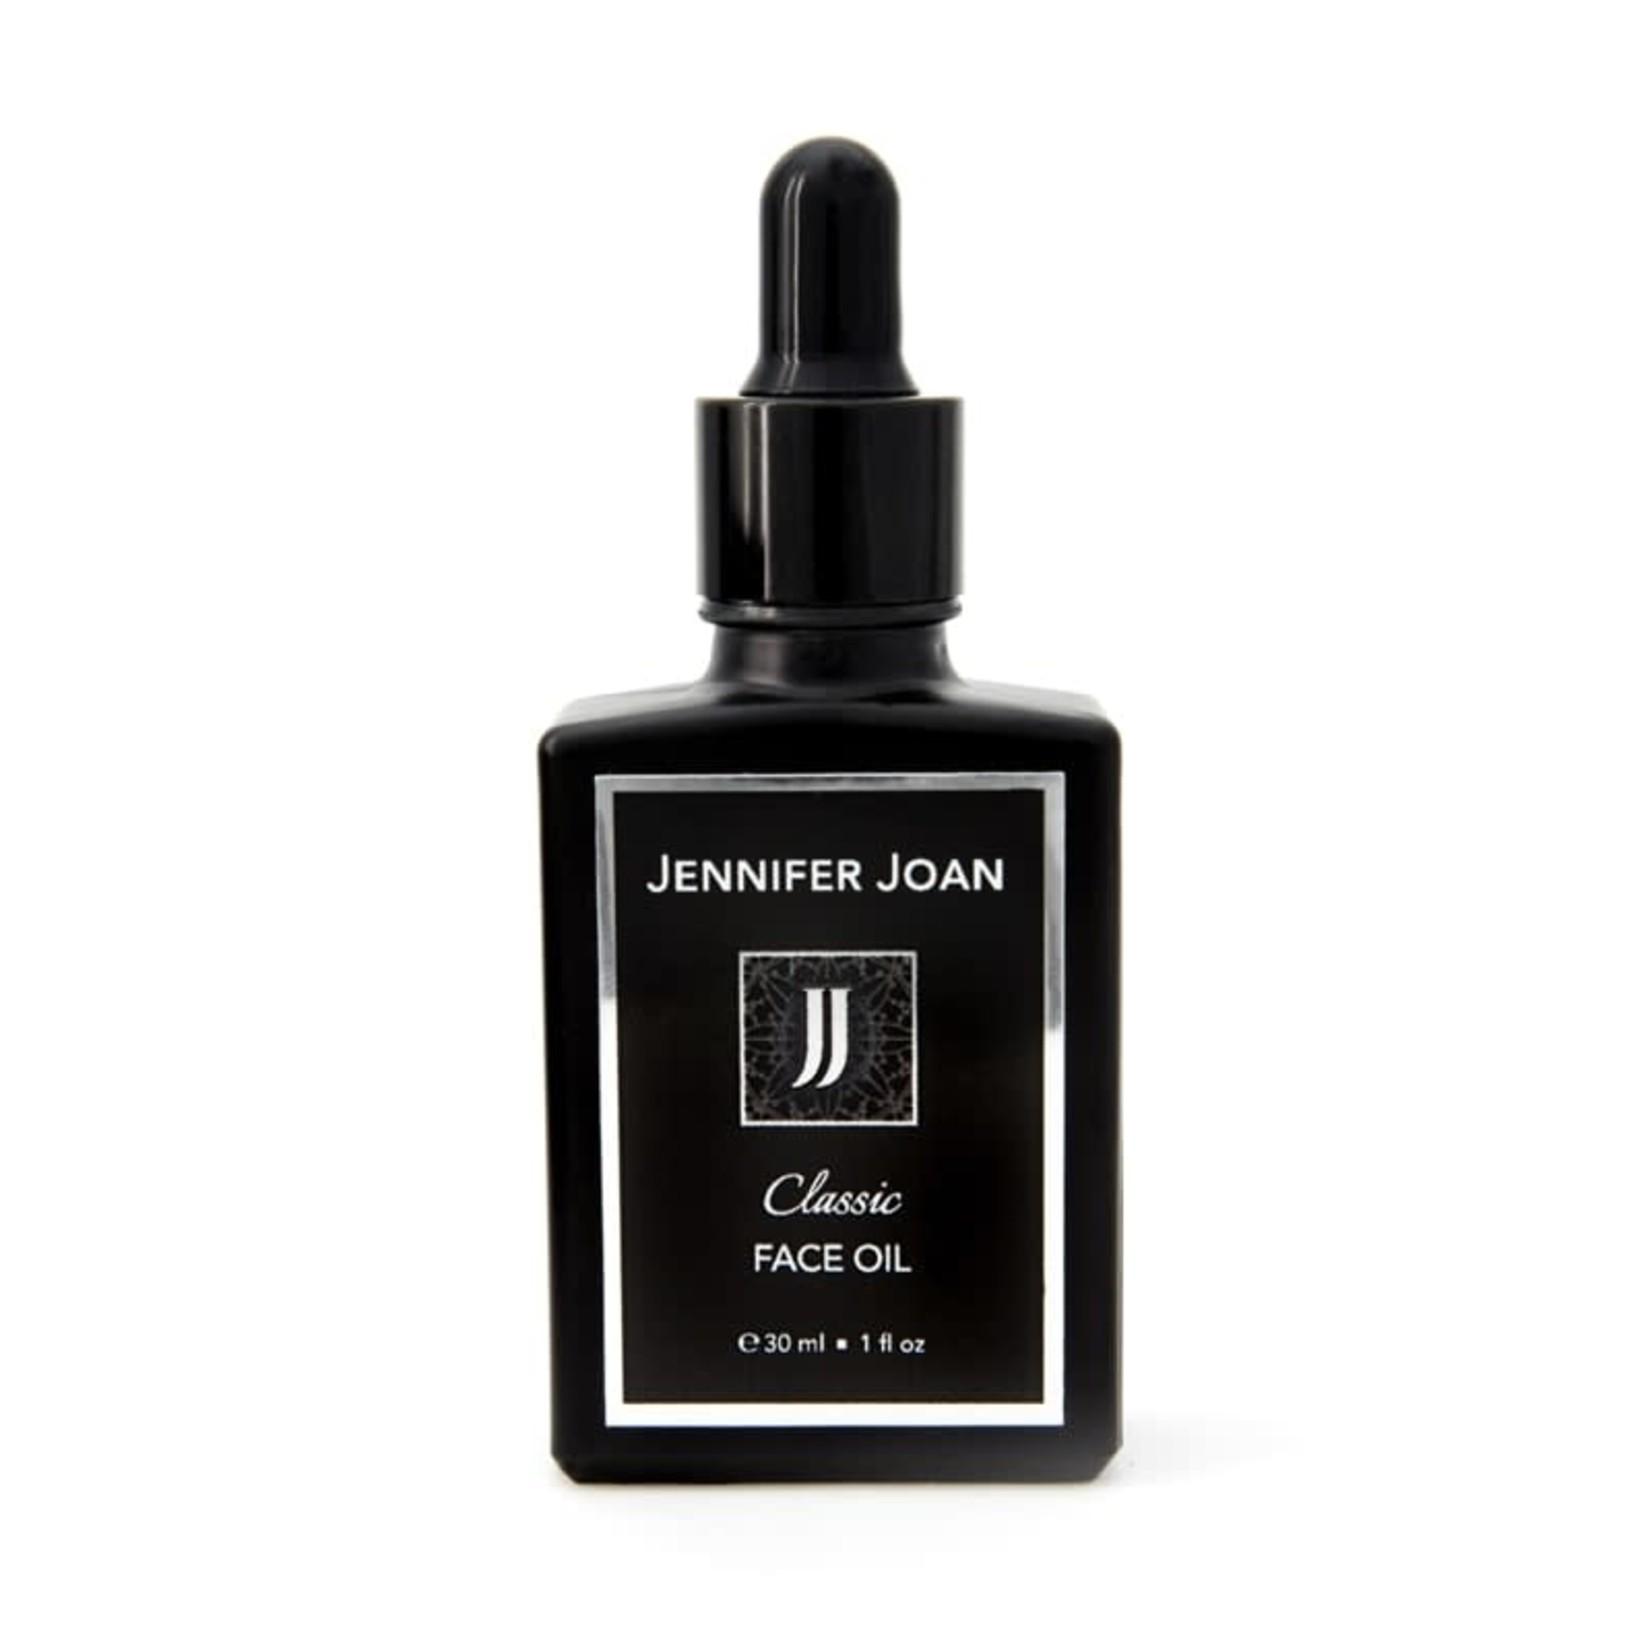 JENNIFER JOAN FACE OIL - CLASSIC